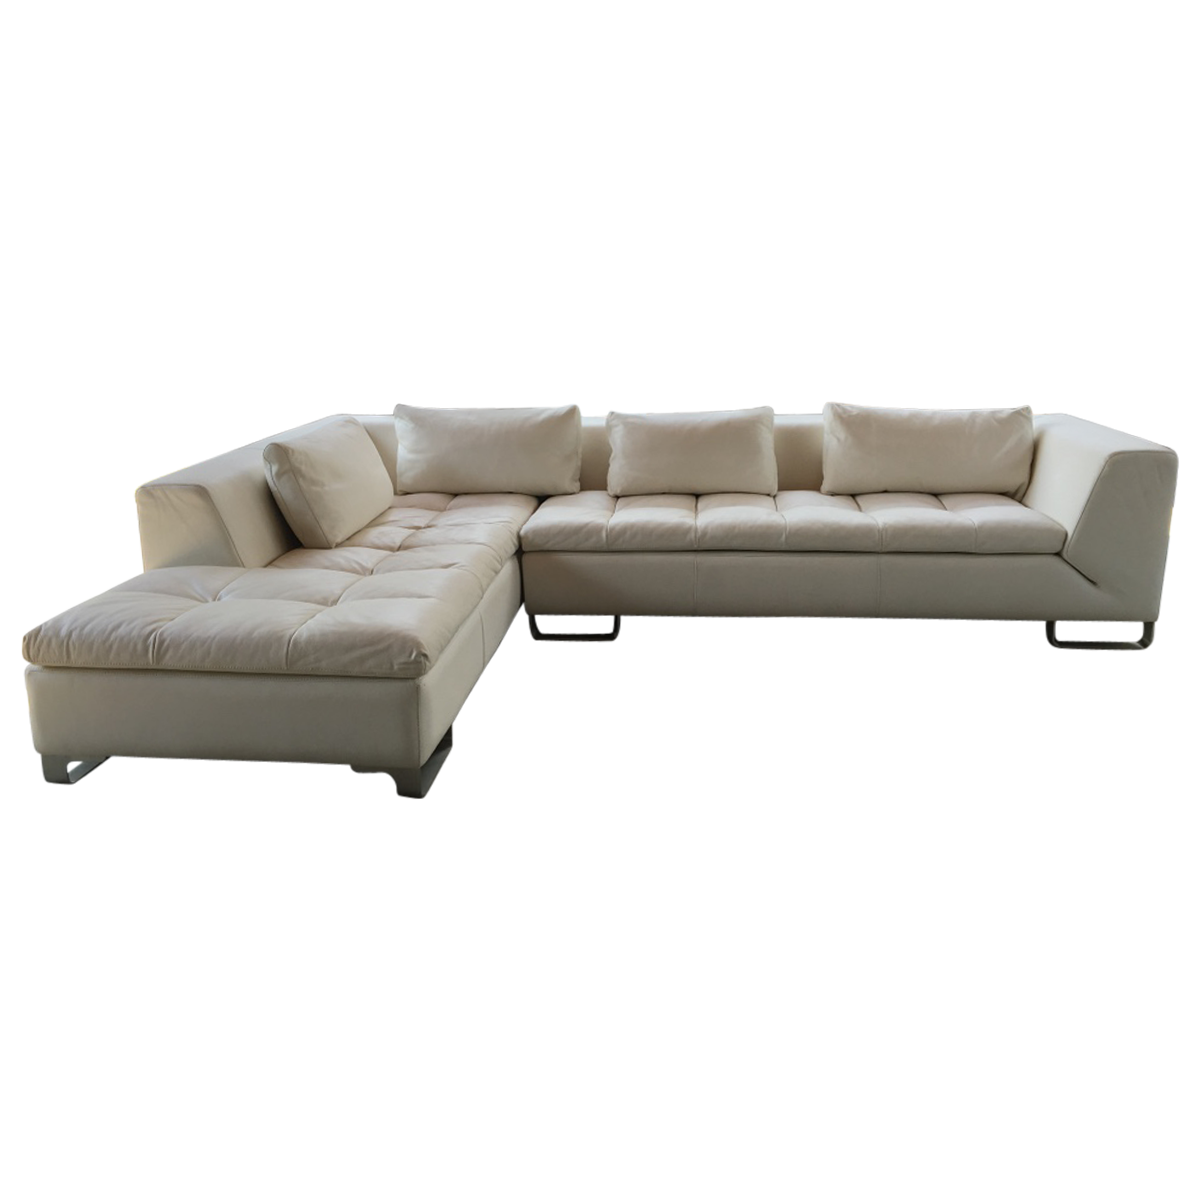 White Leather Sofa Sectional Family Room White Leather Sofas